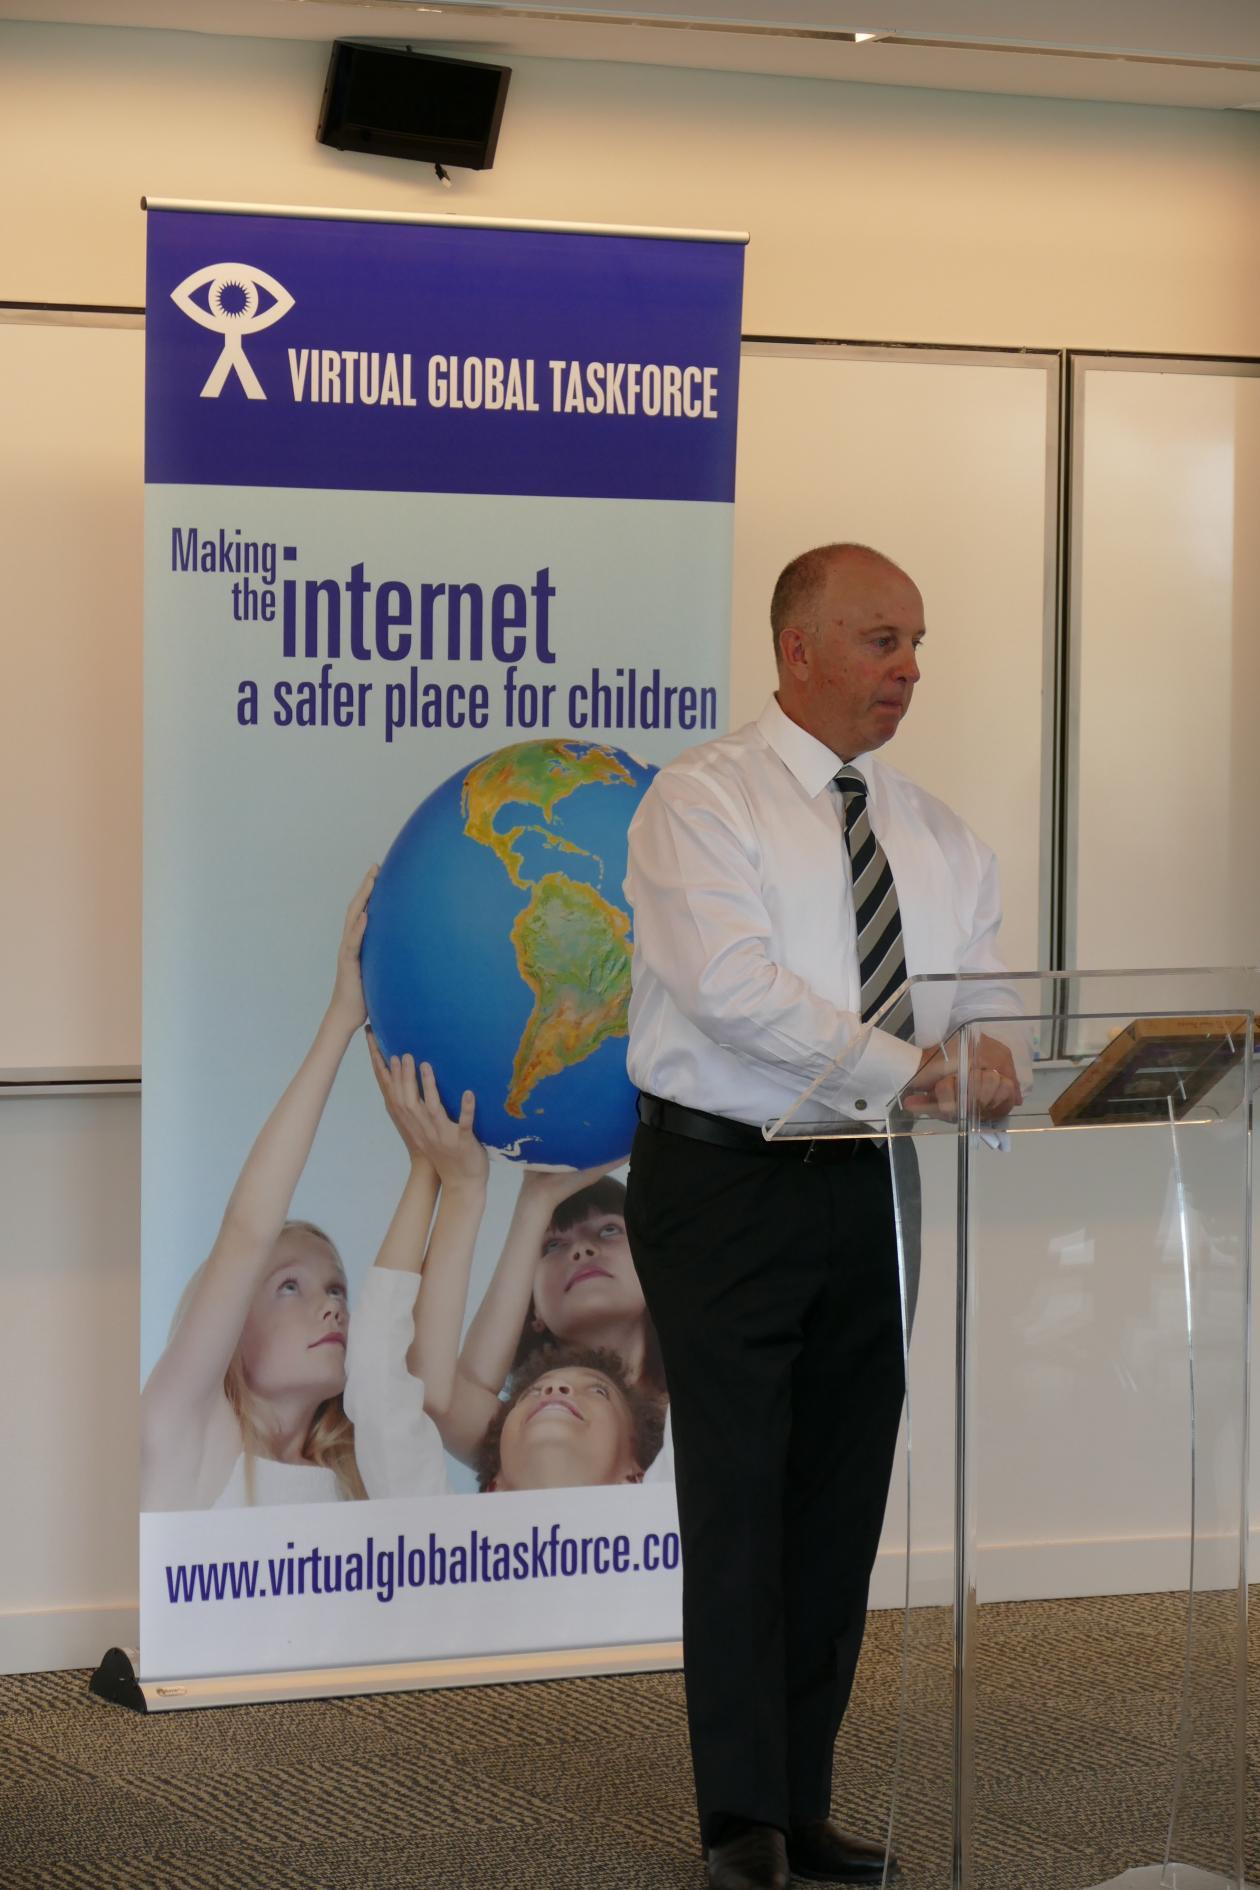 Australian Federal Police Deputy Commissioner Neil Gaughan